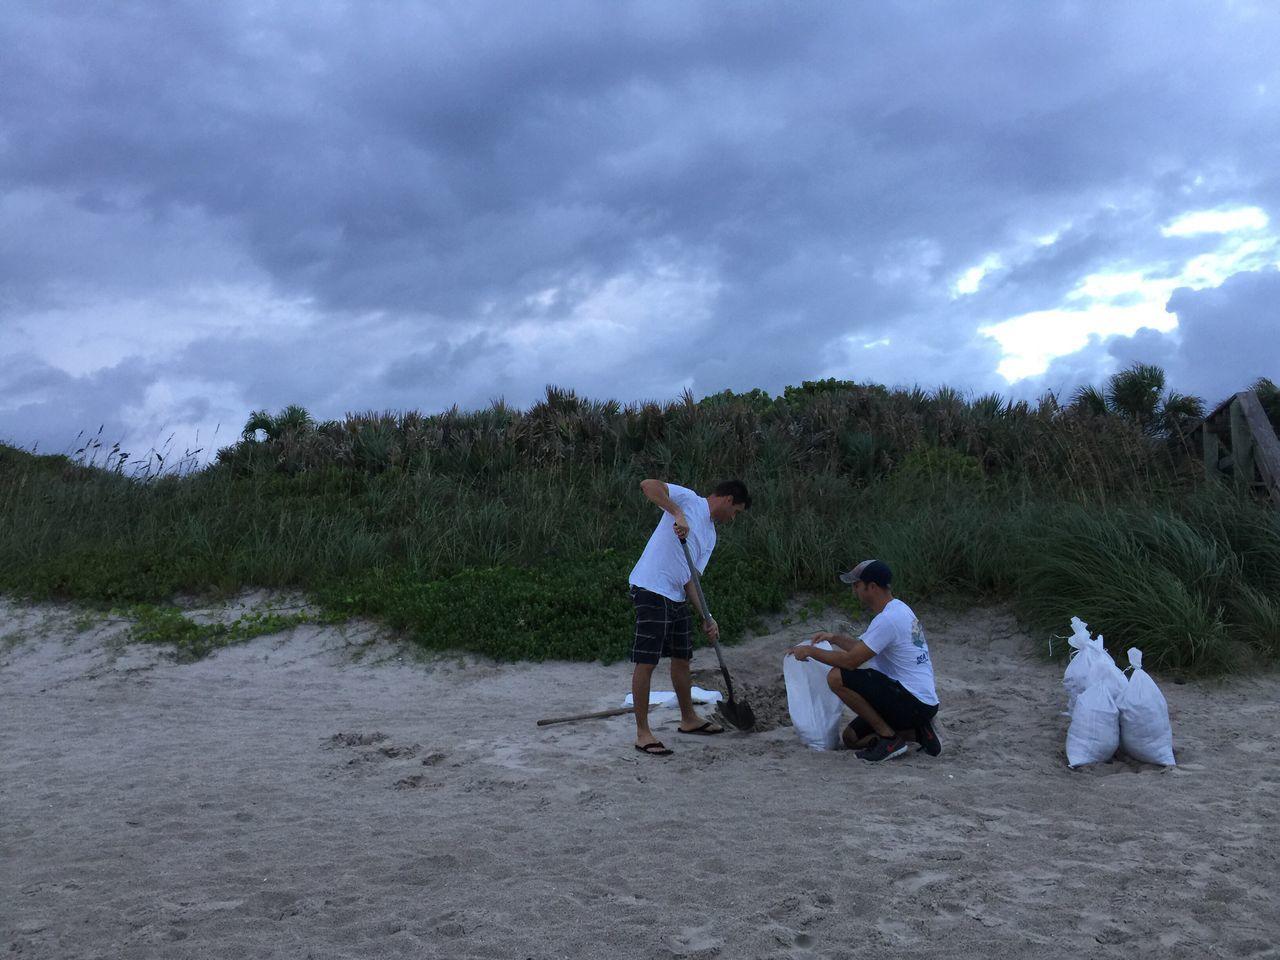 Filling sand bag in preparation for Hurricane Matthew 2016 Melbourne Beach, FL Hurricane Matthew Sand Sand Bags Hurricane Preps